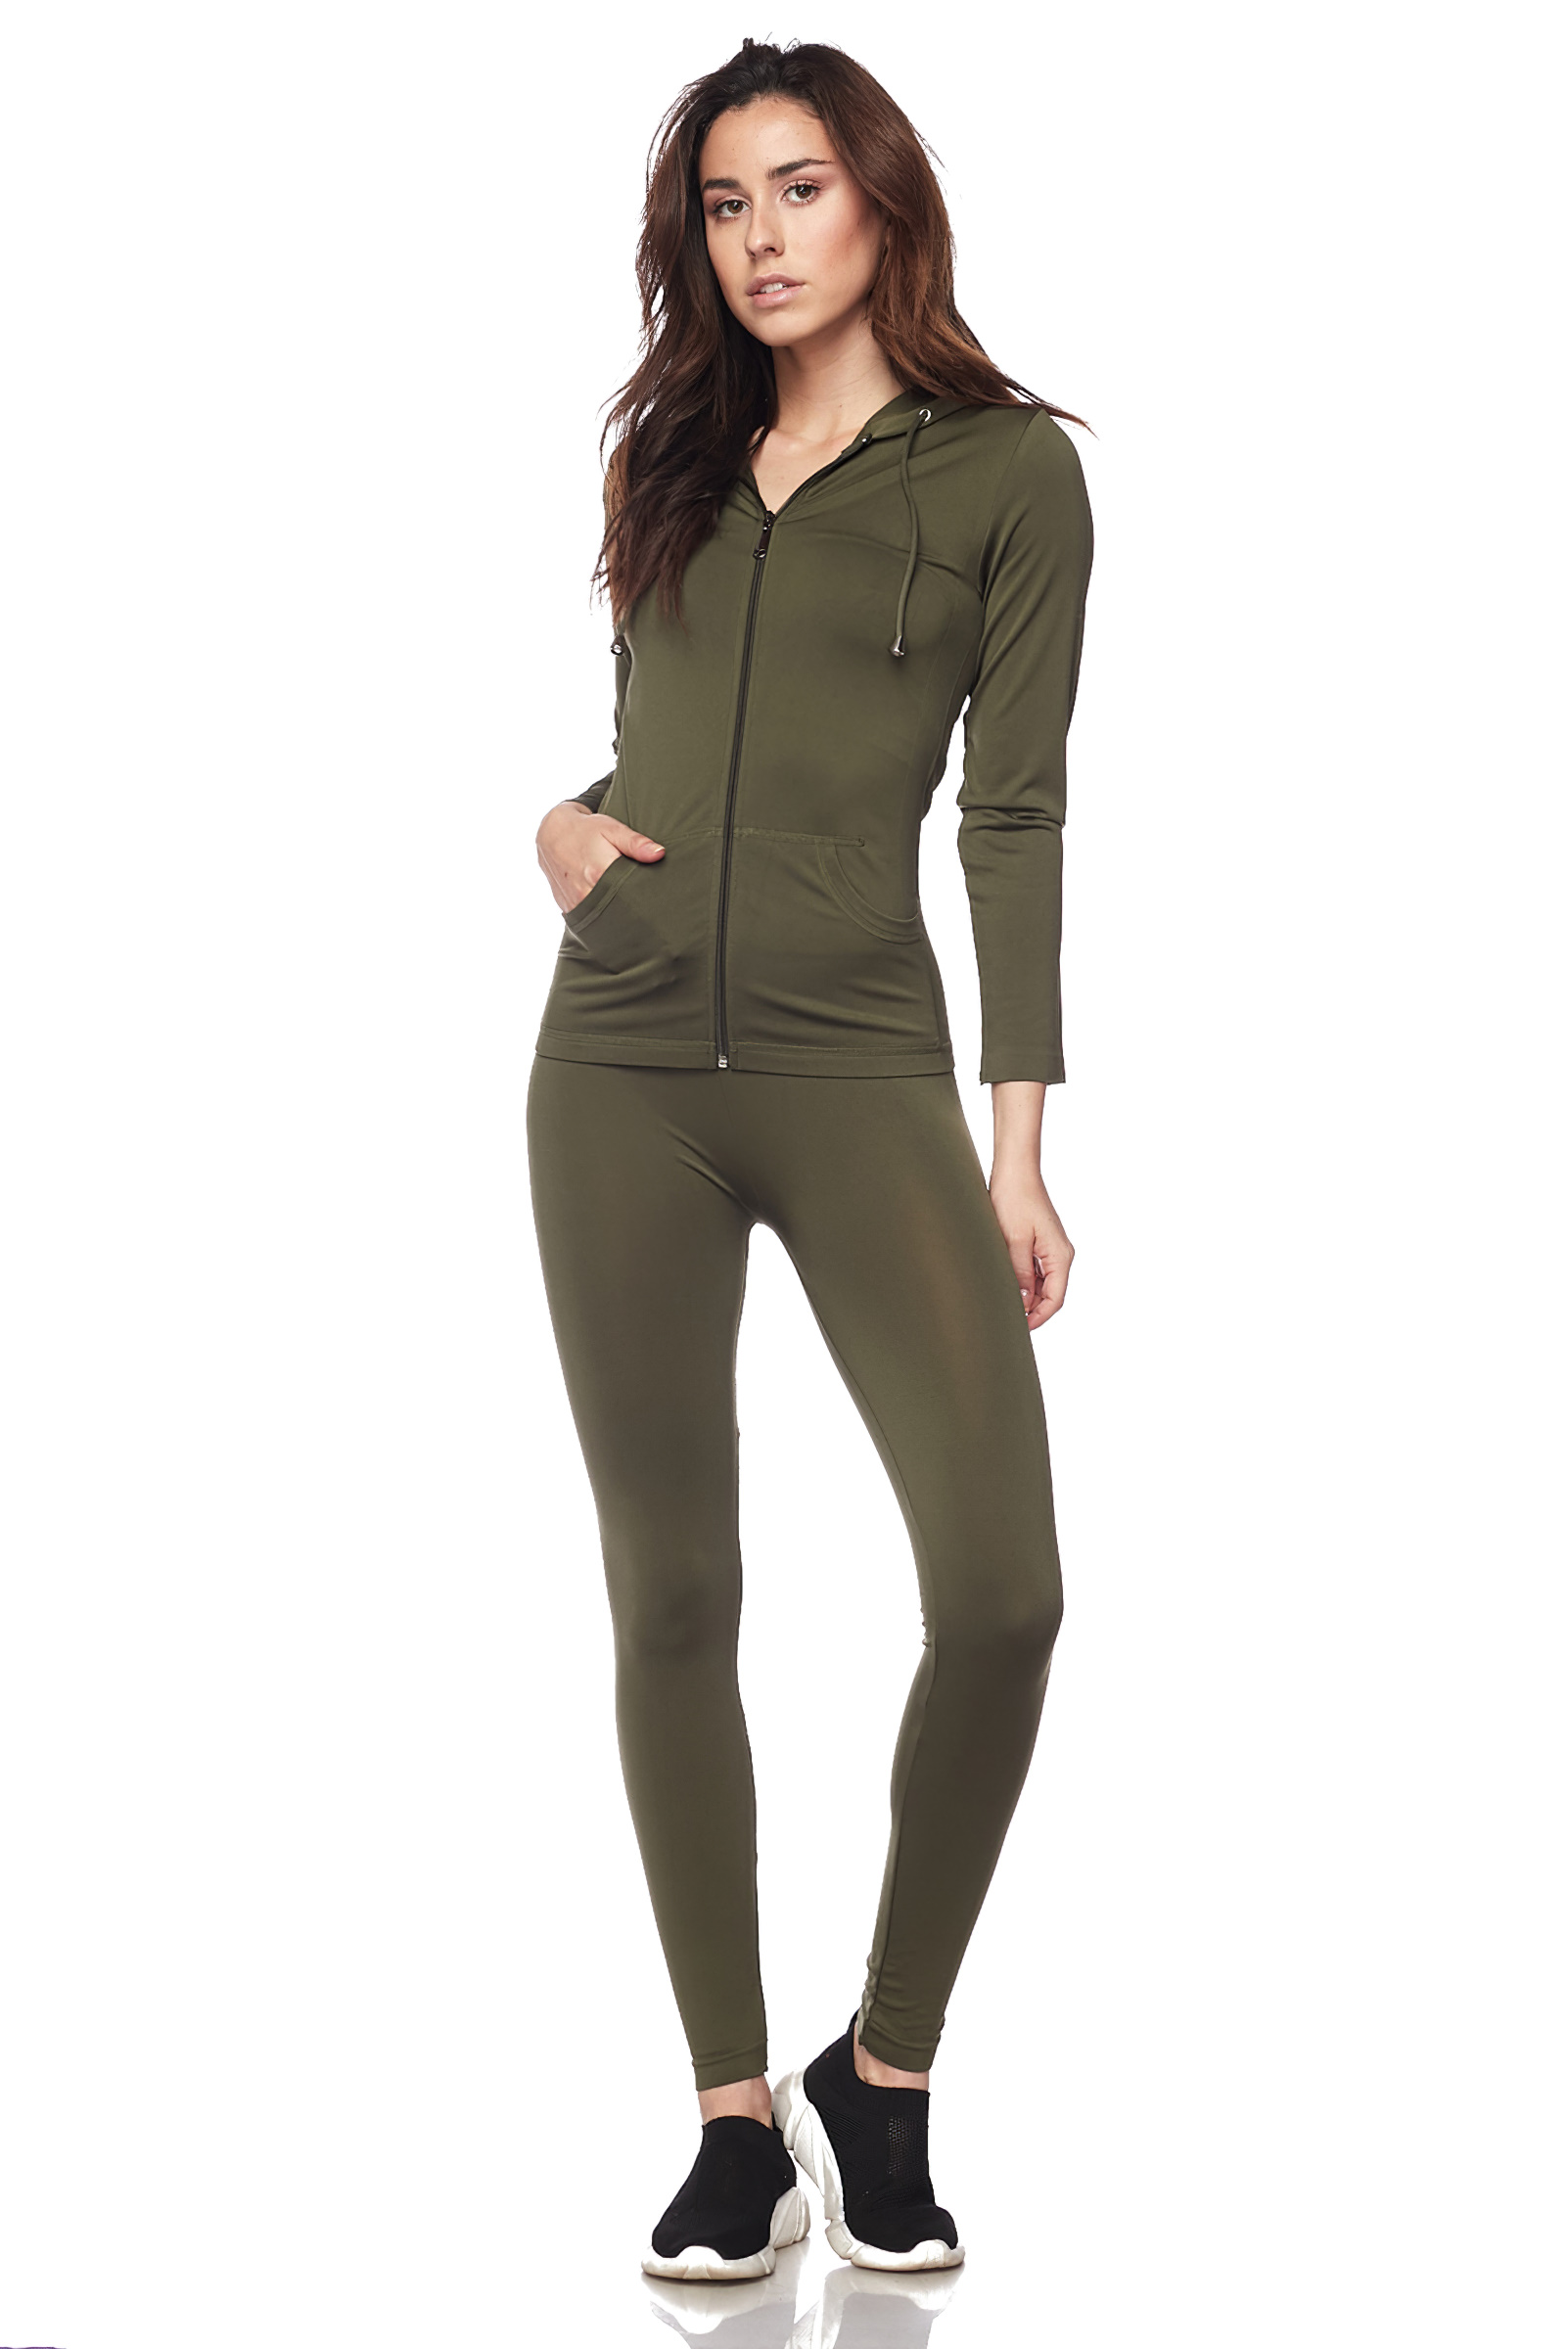 Women-039-s-Juniors-Active-Set-Wear-Zip-Up-Hoodie-and-Legging thumbnail 32